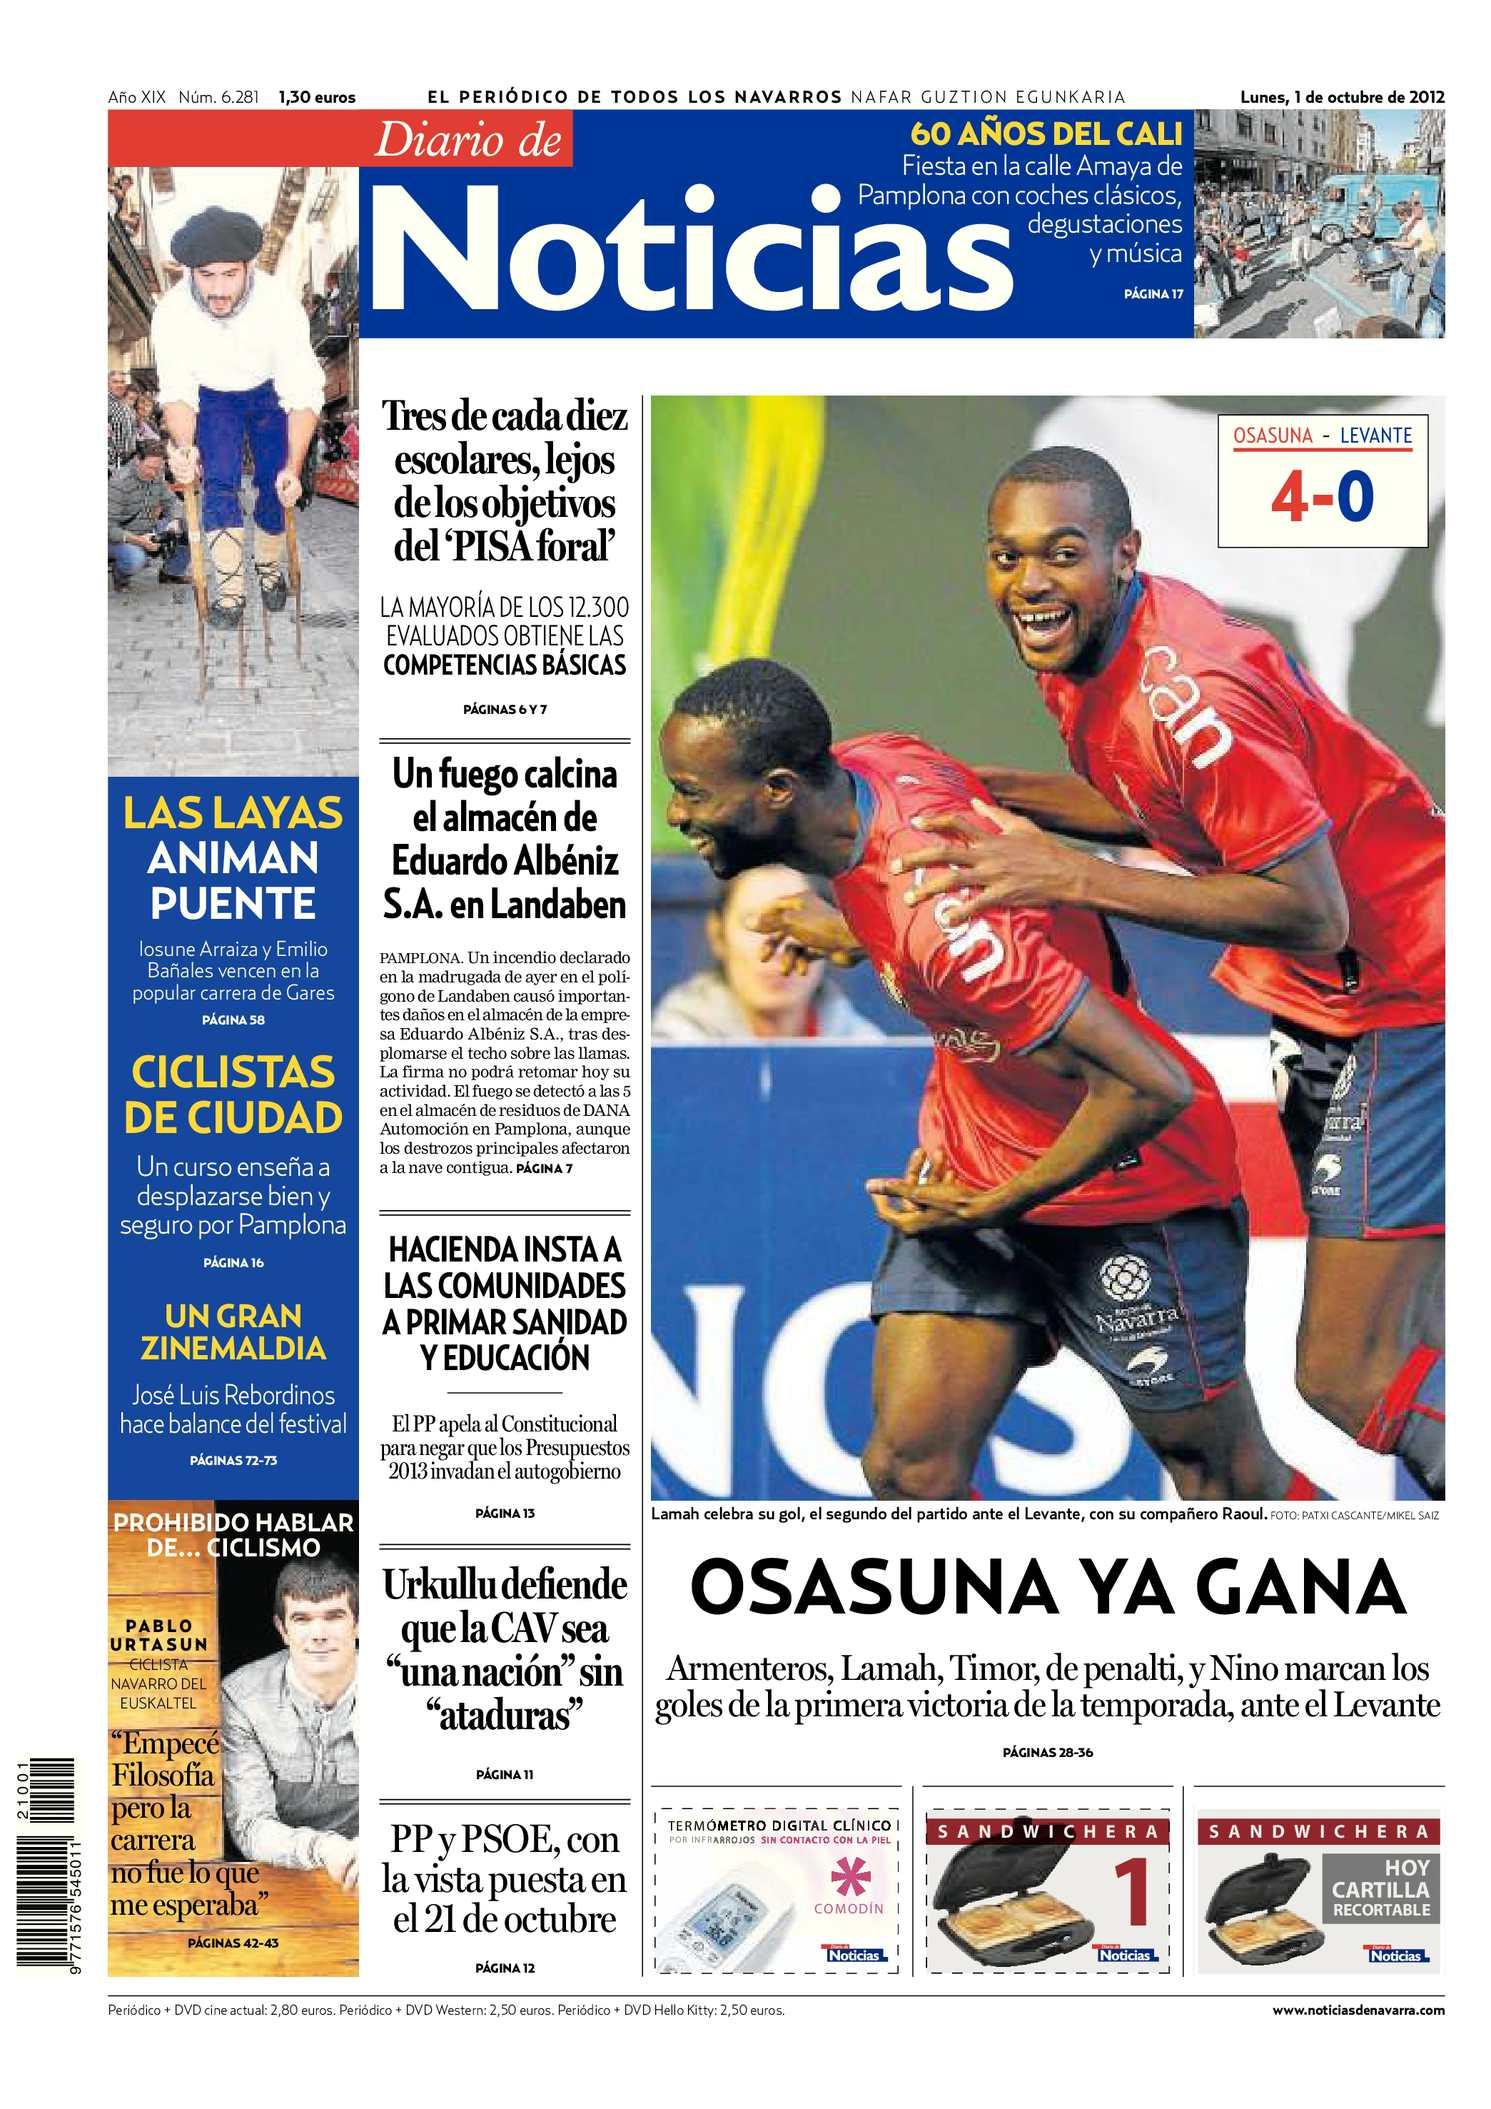 Calaméo - Diario de Noticias 20121001 fa5af88fec8d